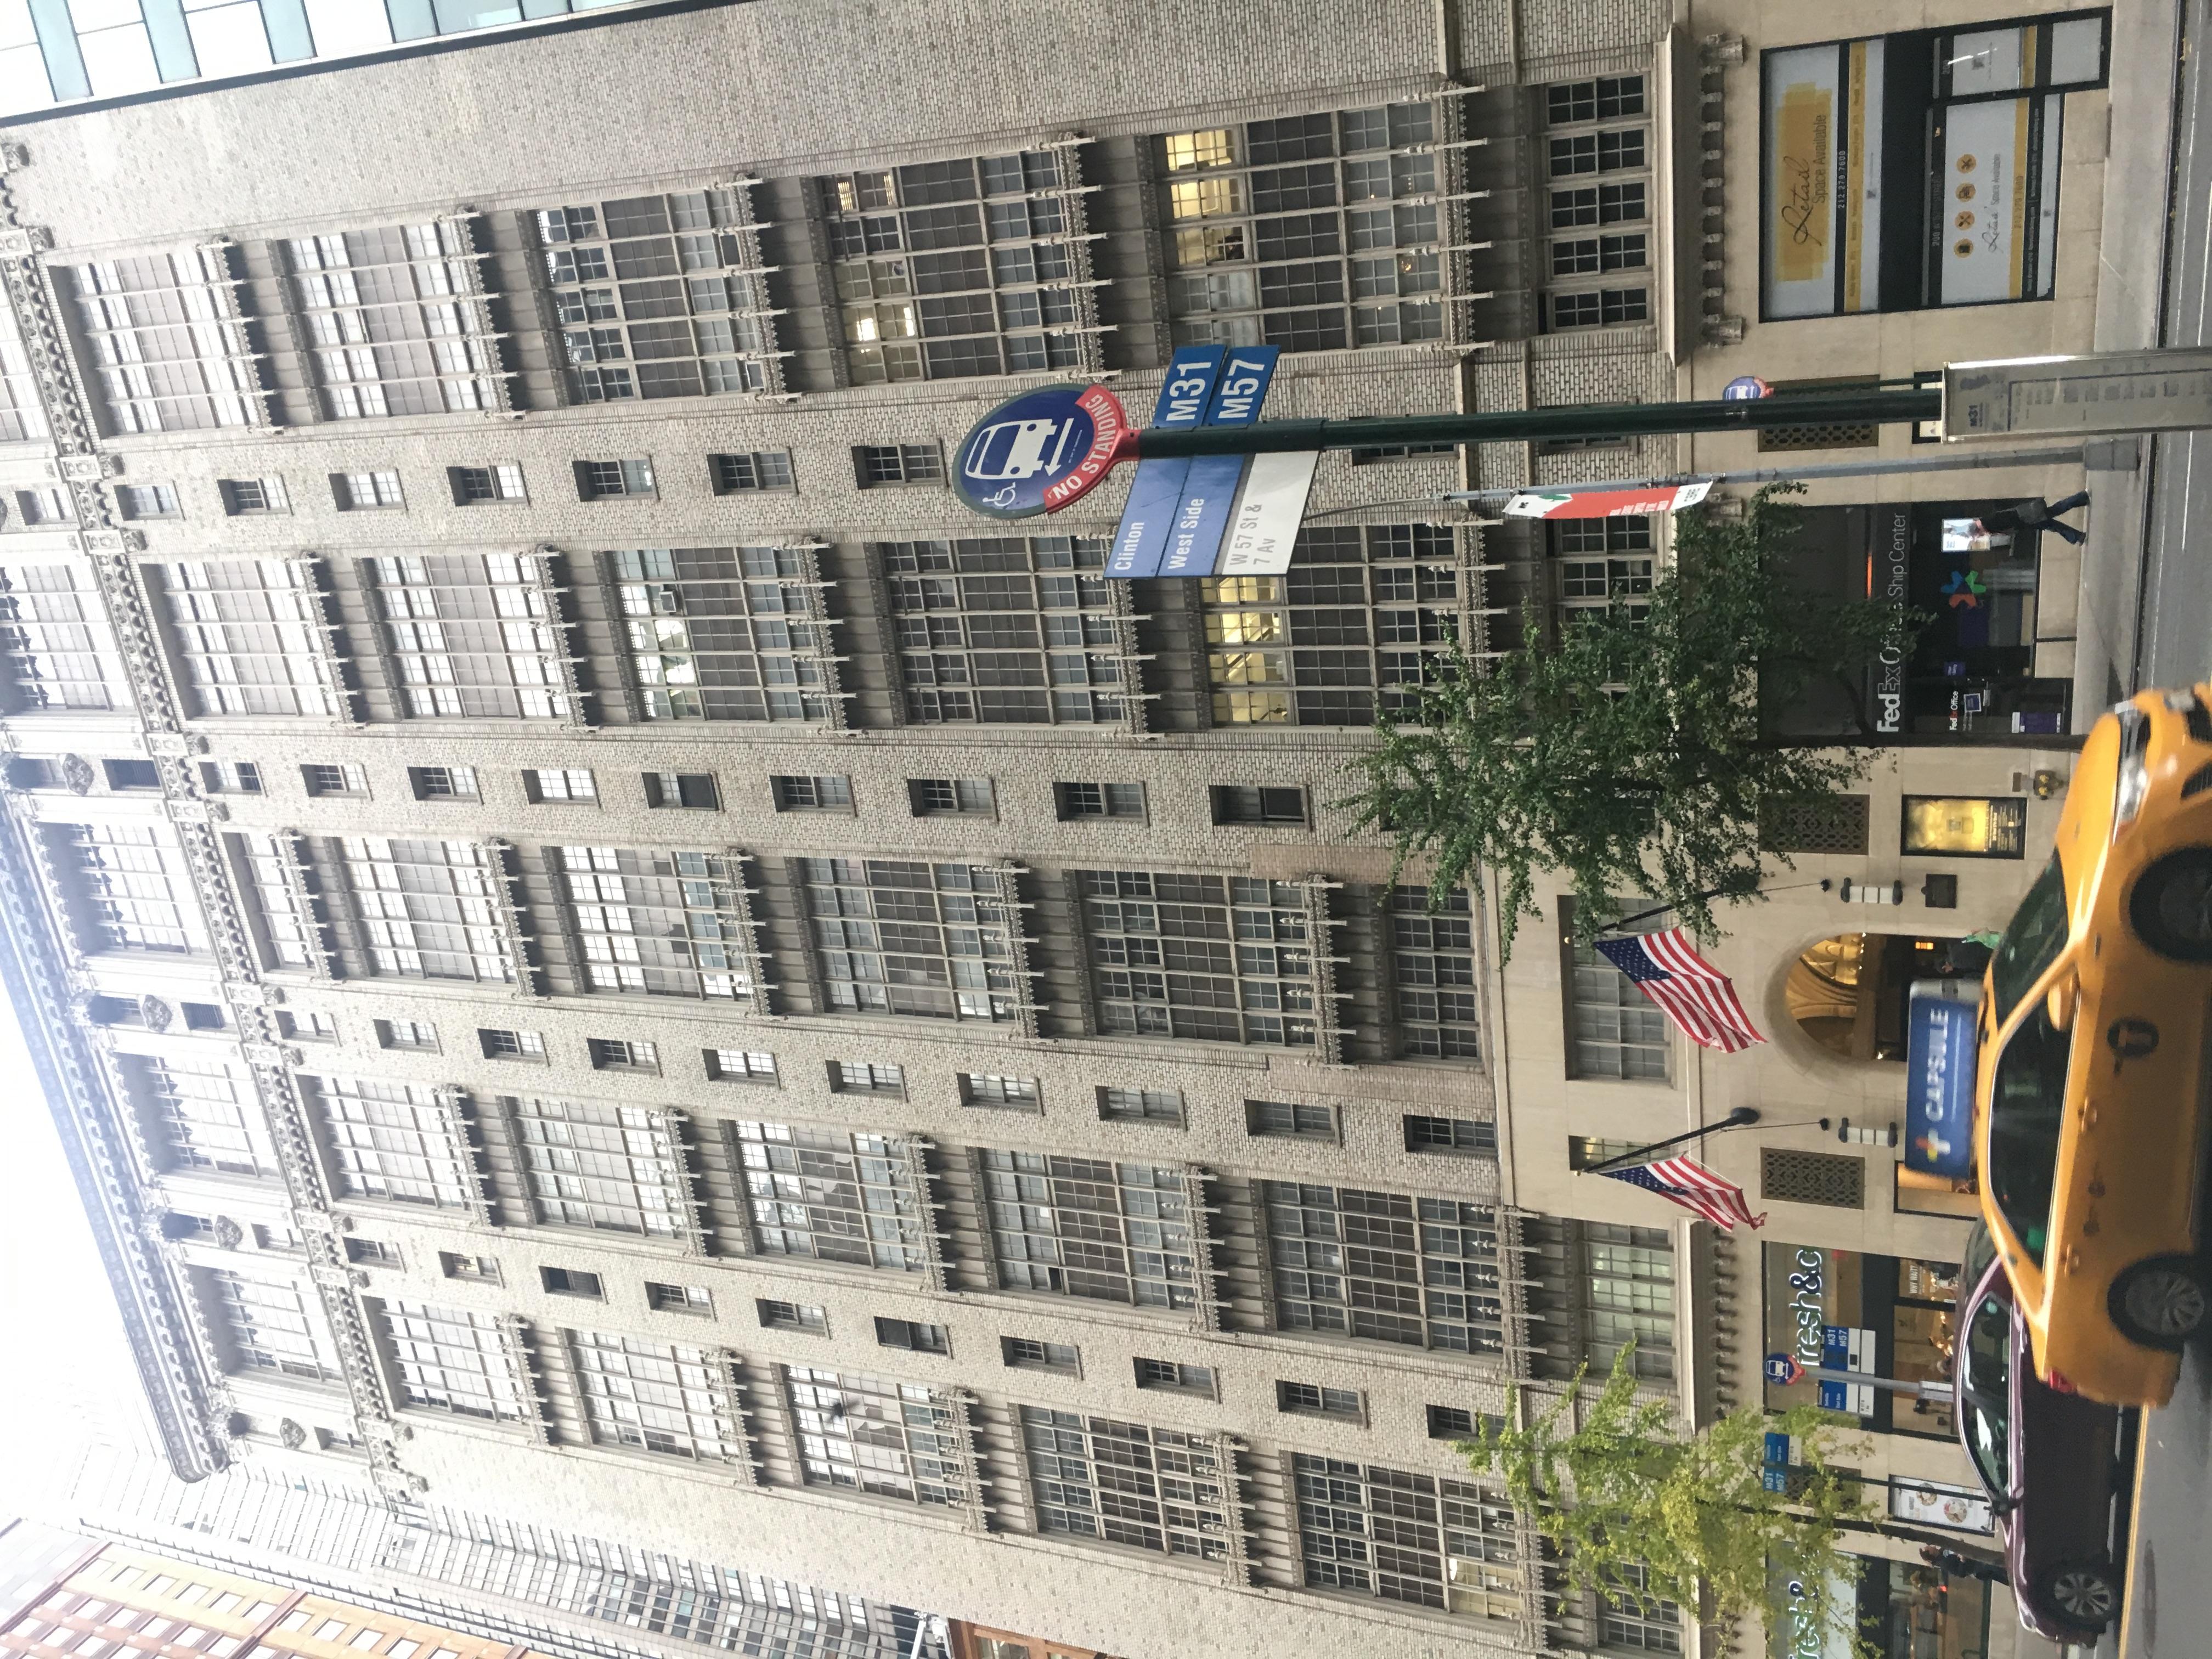 FileRodin Studios 200 West 57th Street 7th Avenue Manhattan New